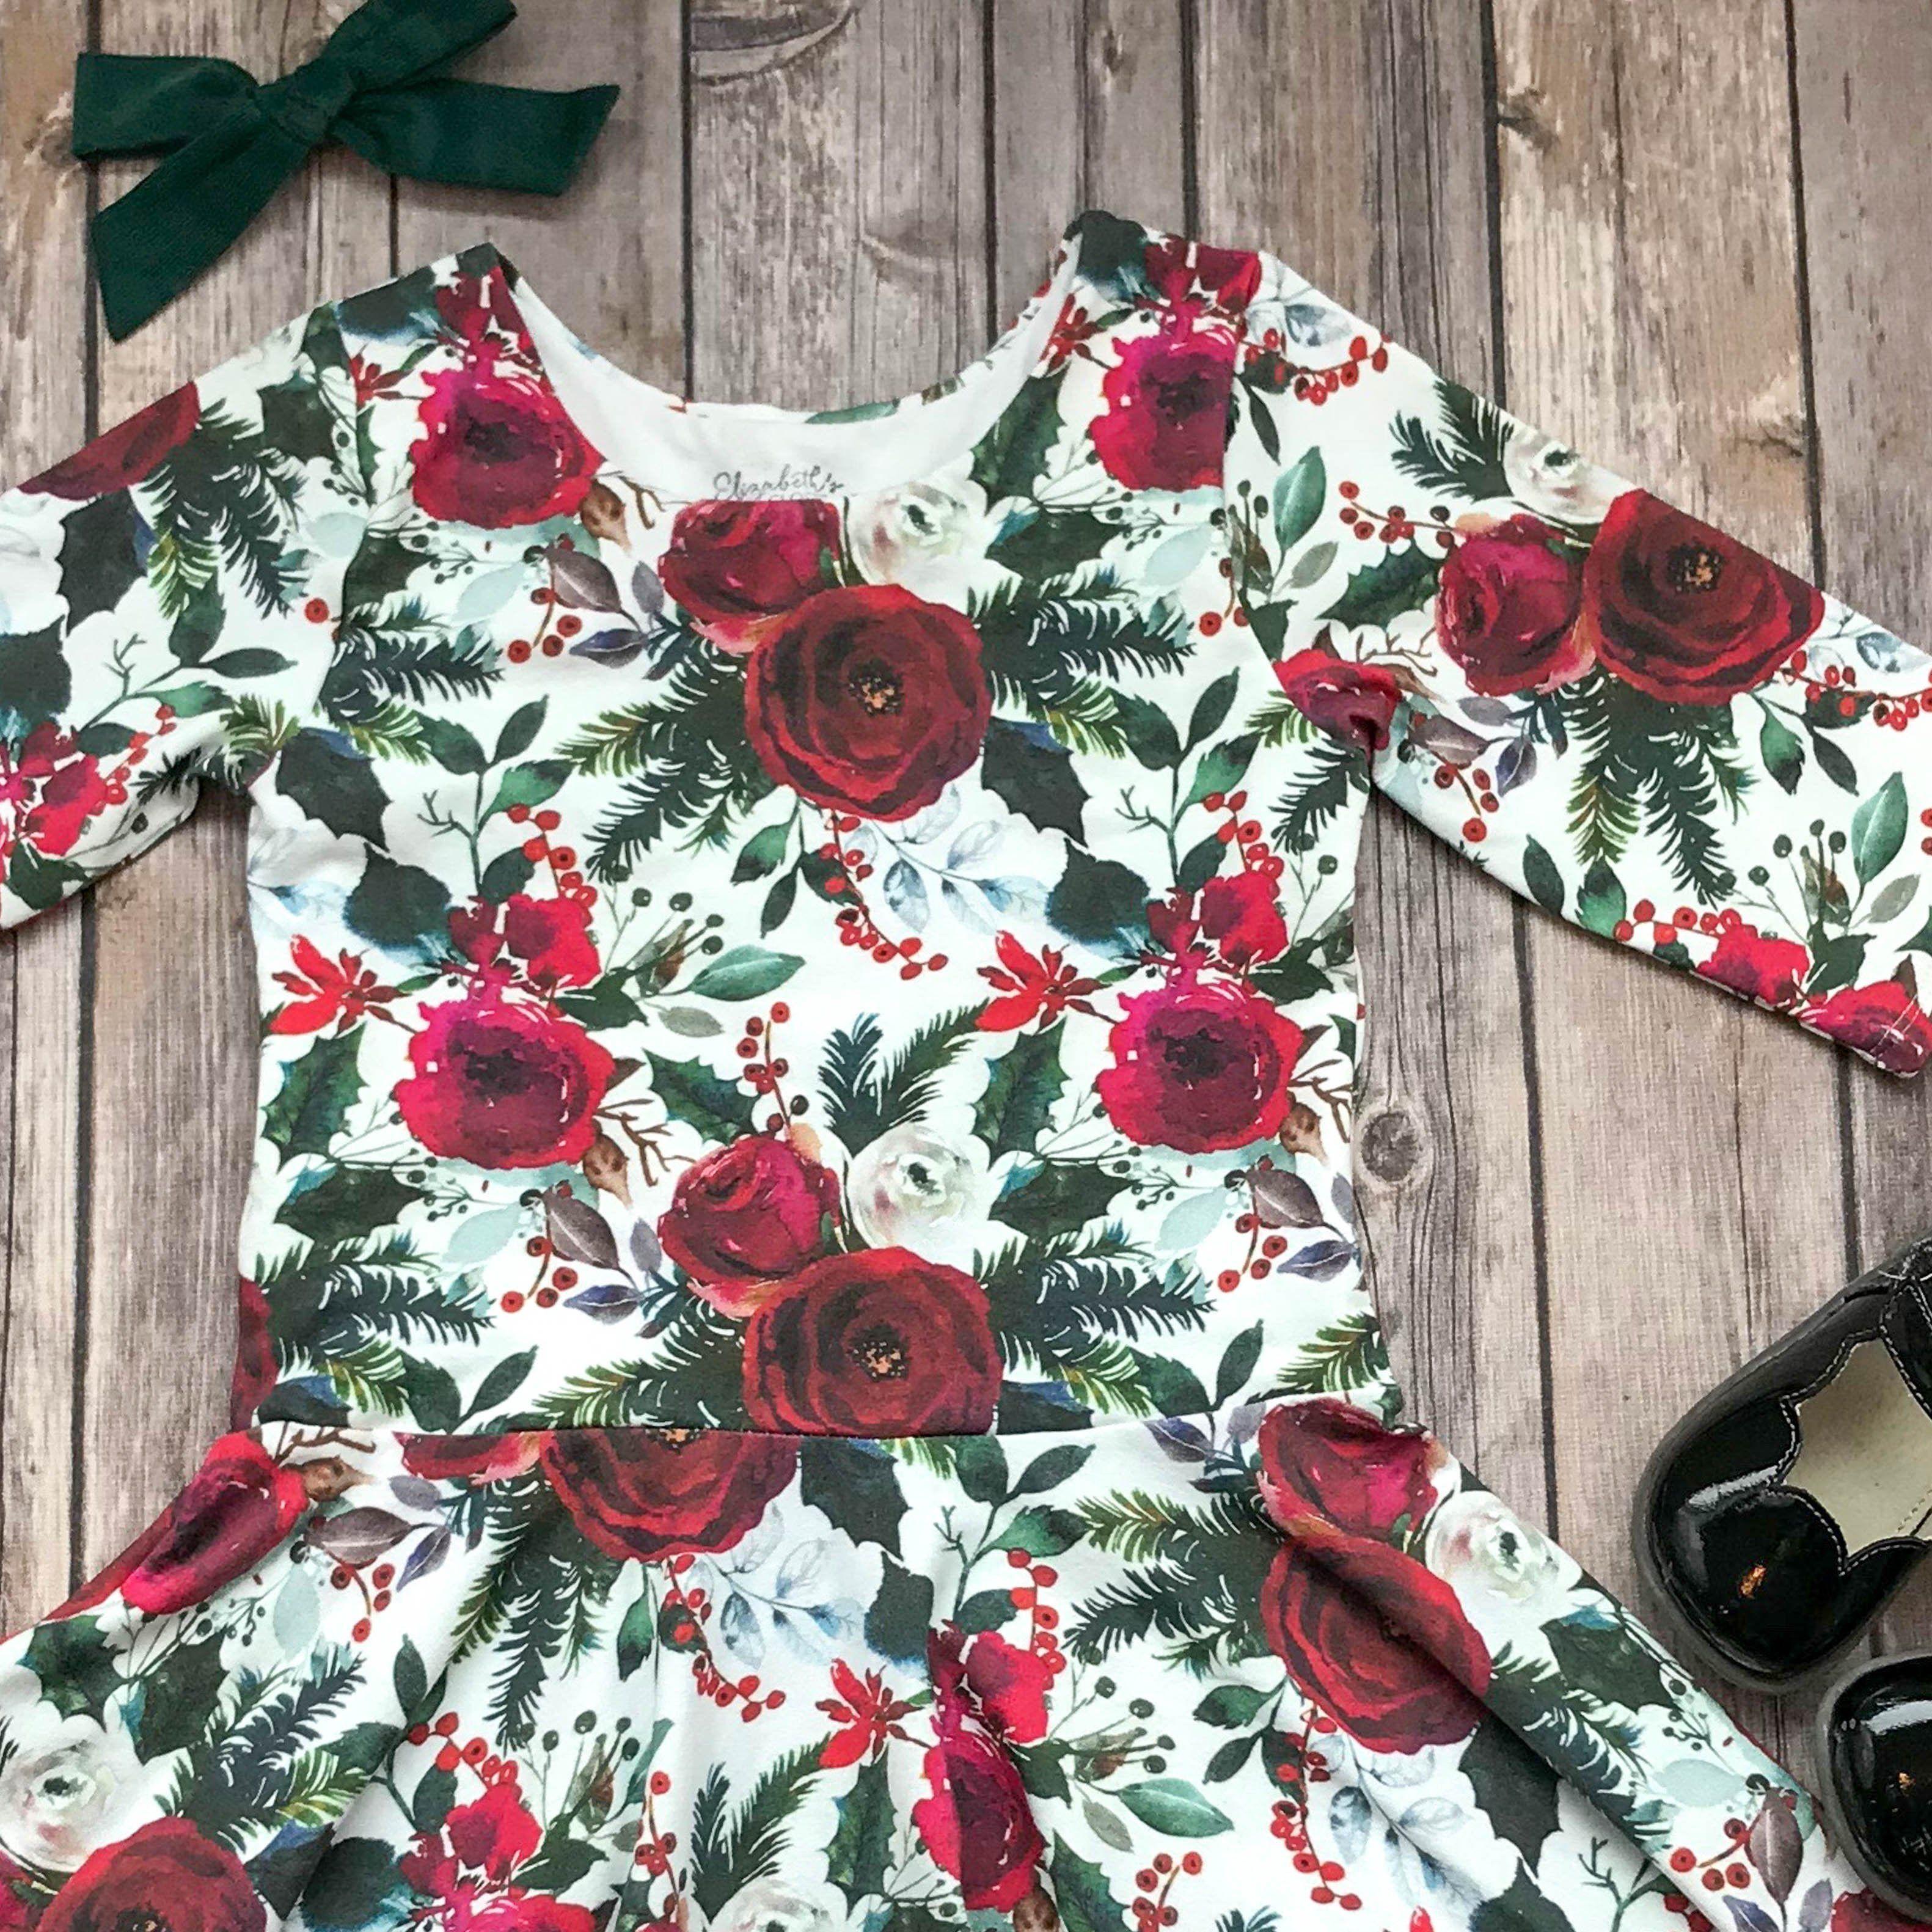 Ready To Ship Christmas Floral Twirl Dress 4t Long Sleeves Twirl Dress Dresses 3t Dress [ 3162 x 3162 Pixel ]